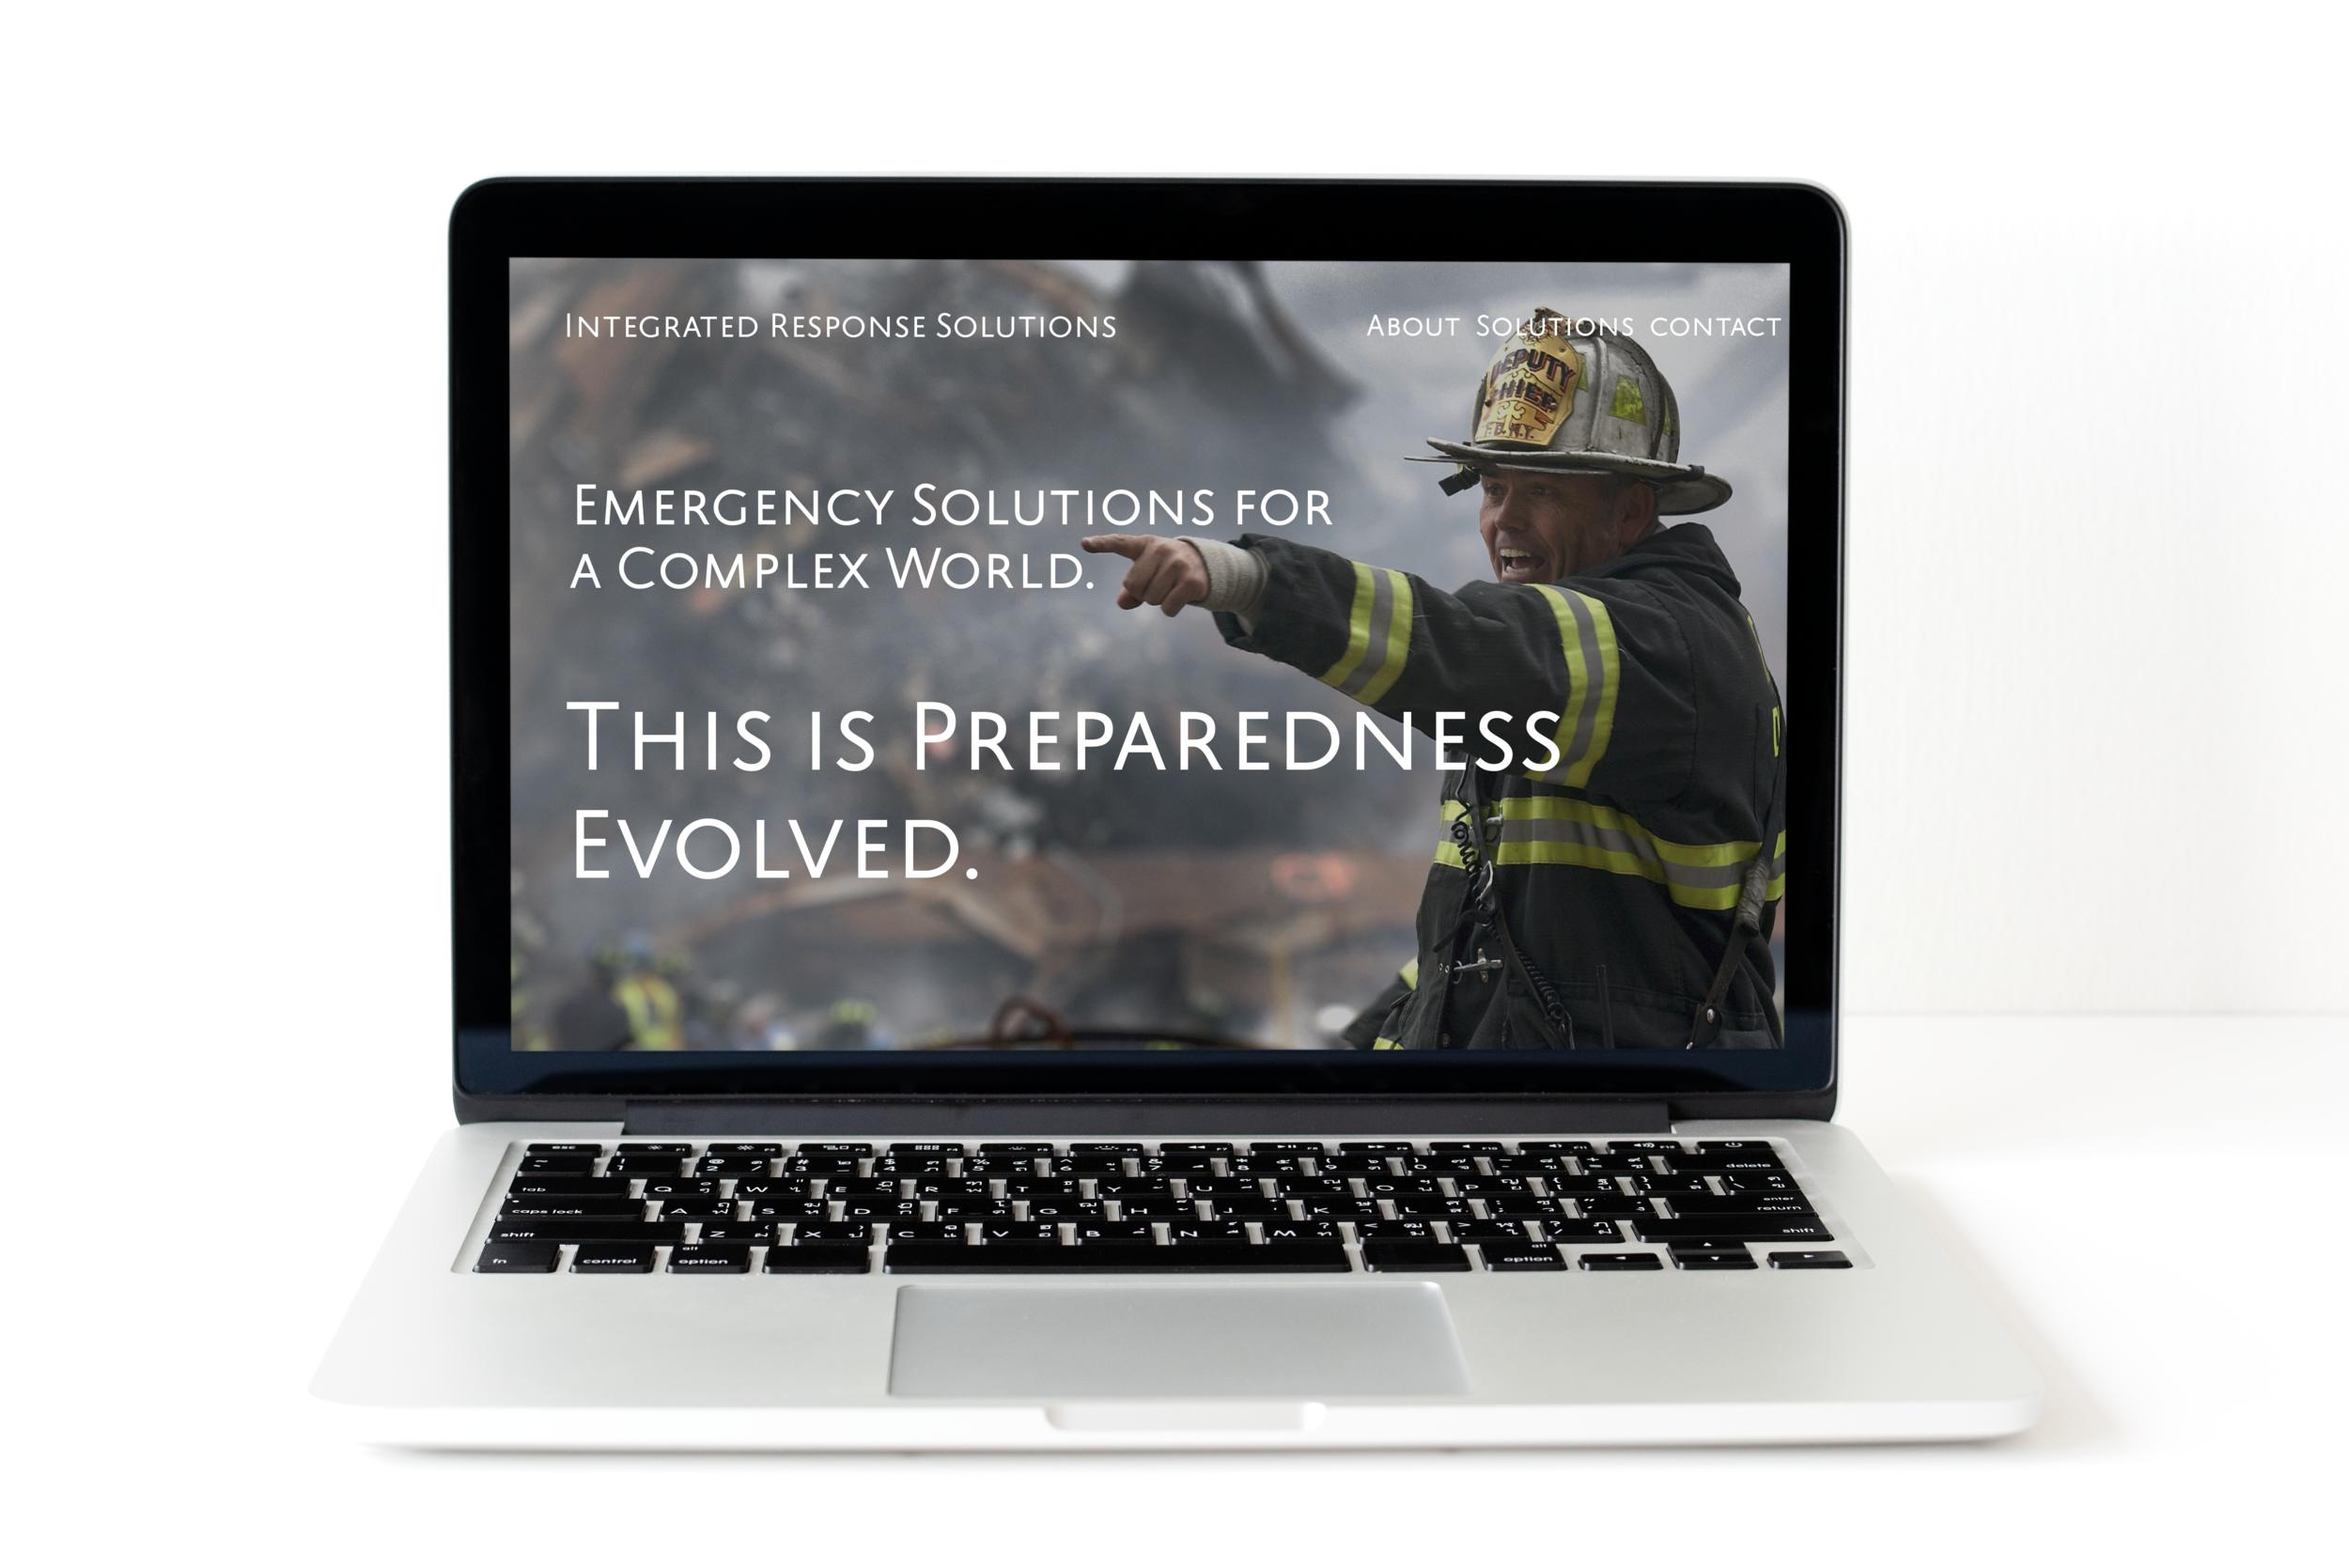 Integrated Response Solutions - Website design